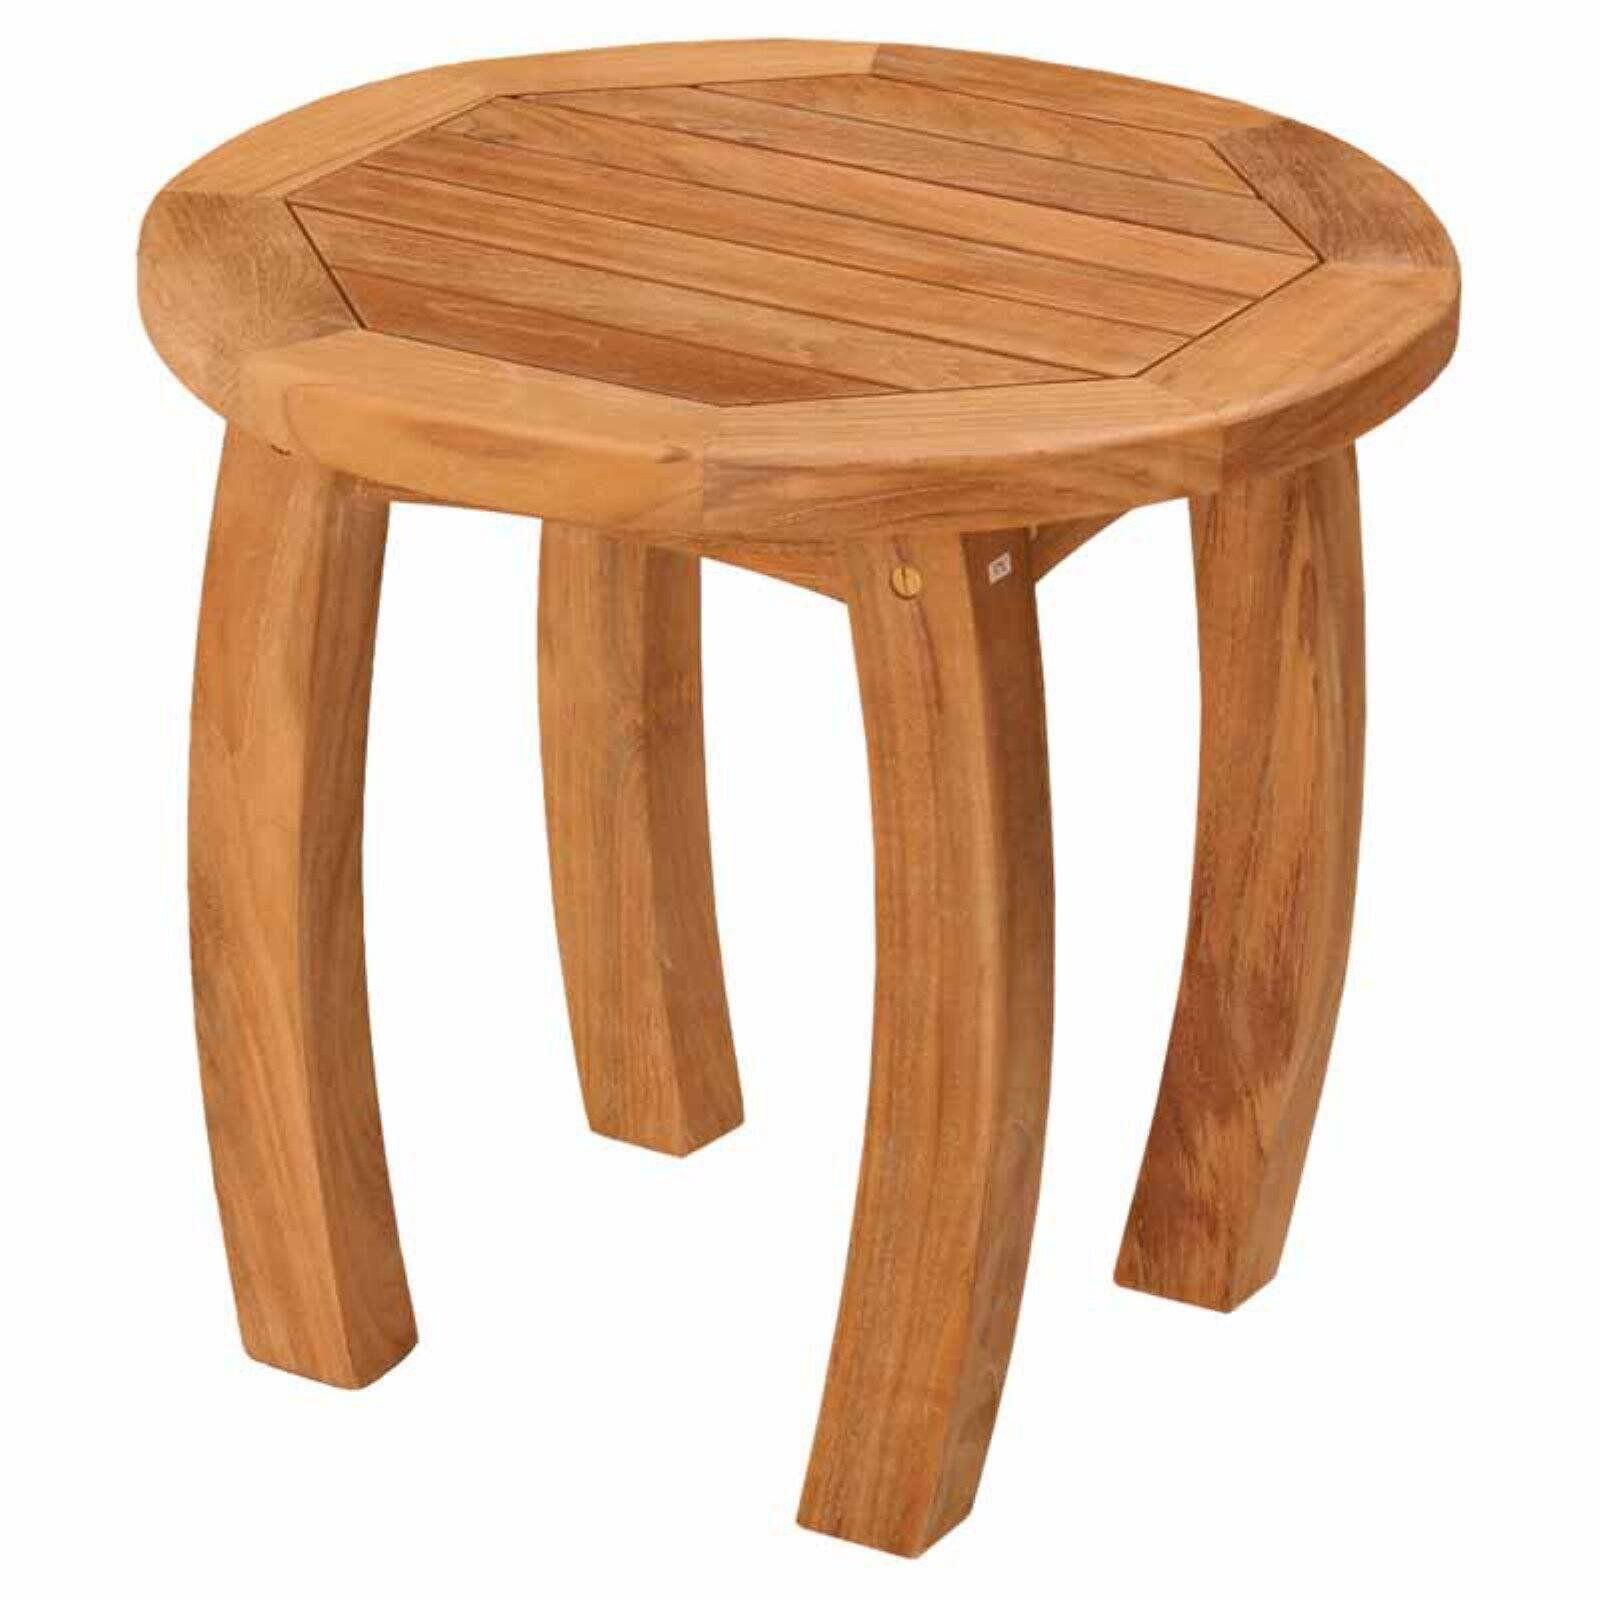 Tortuga Outdoor Jakarta 20 In Round Wood Side Table Walmart Com In 2020 Round Wood Side Table Side Table Wood Teak Table